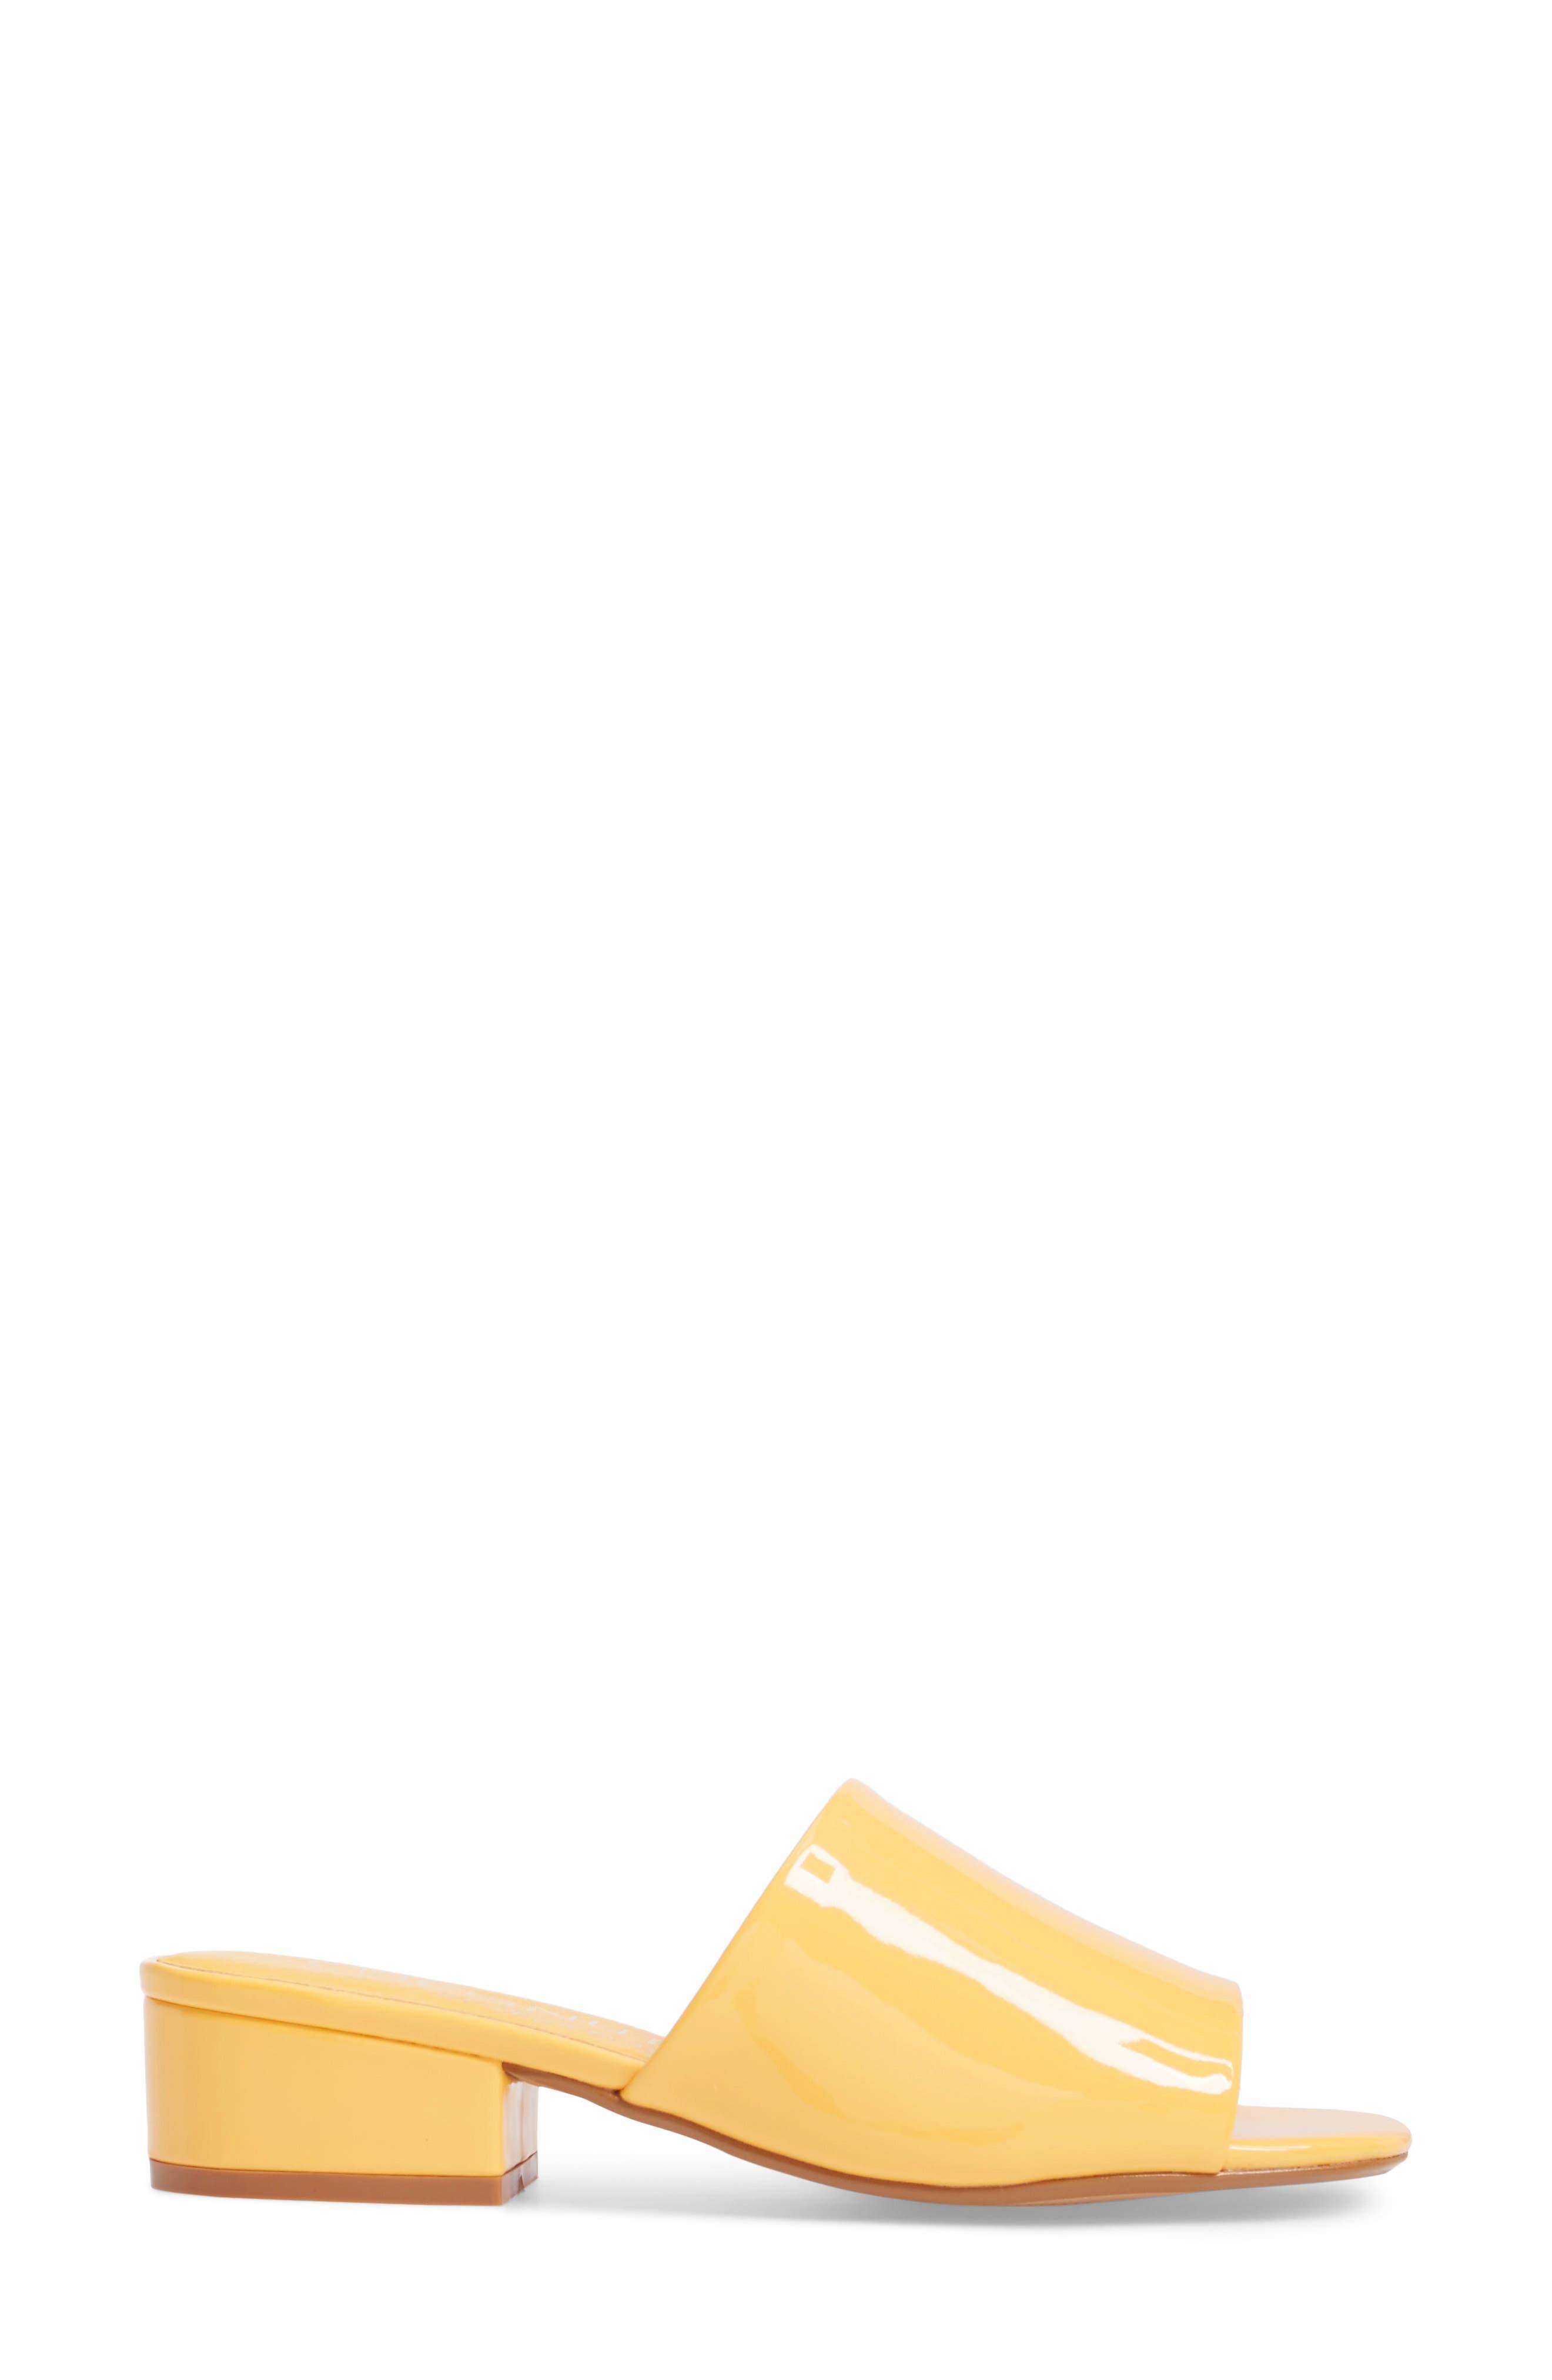 Plantain Slide Sandal,                             Alternate thumbnail 3, color,                             Mango